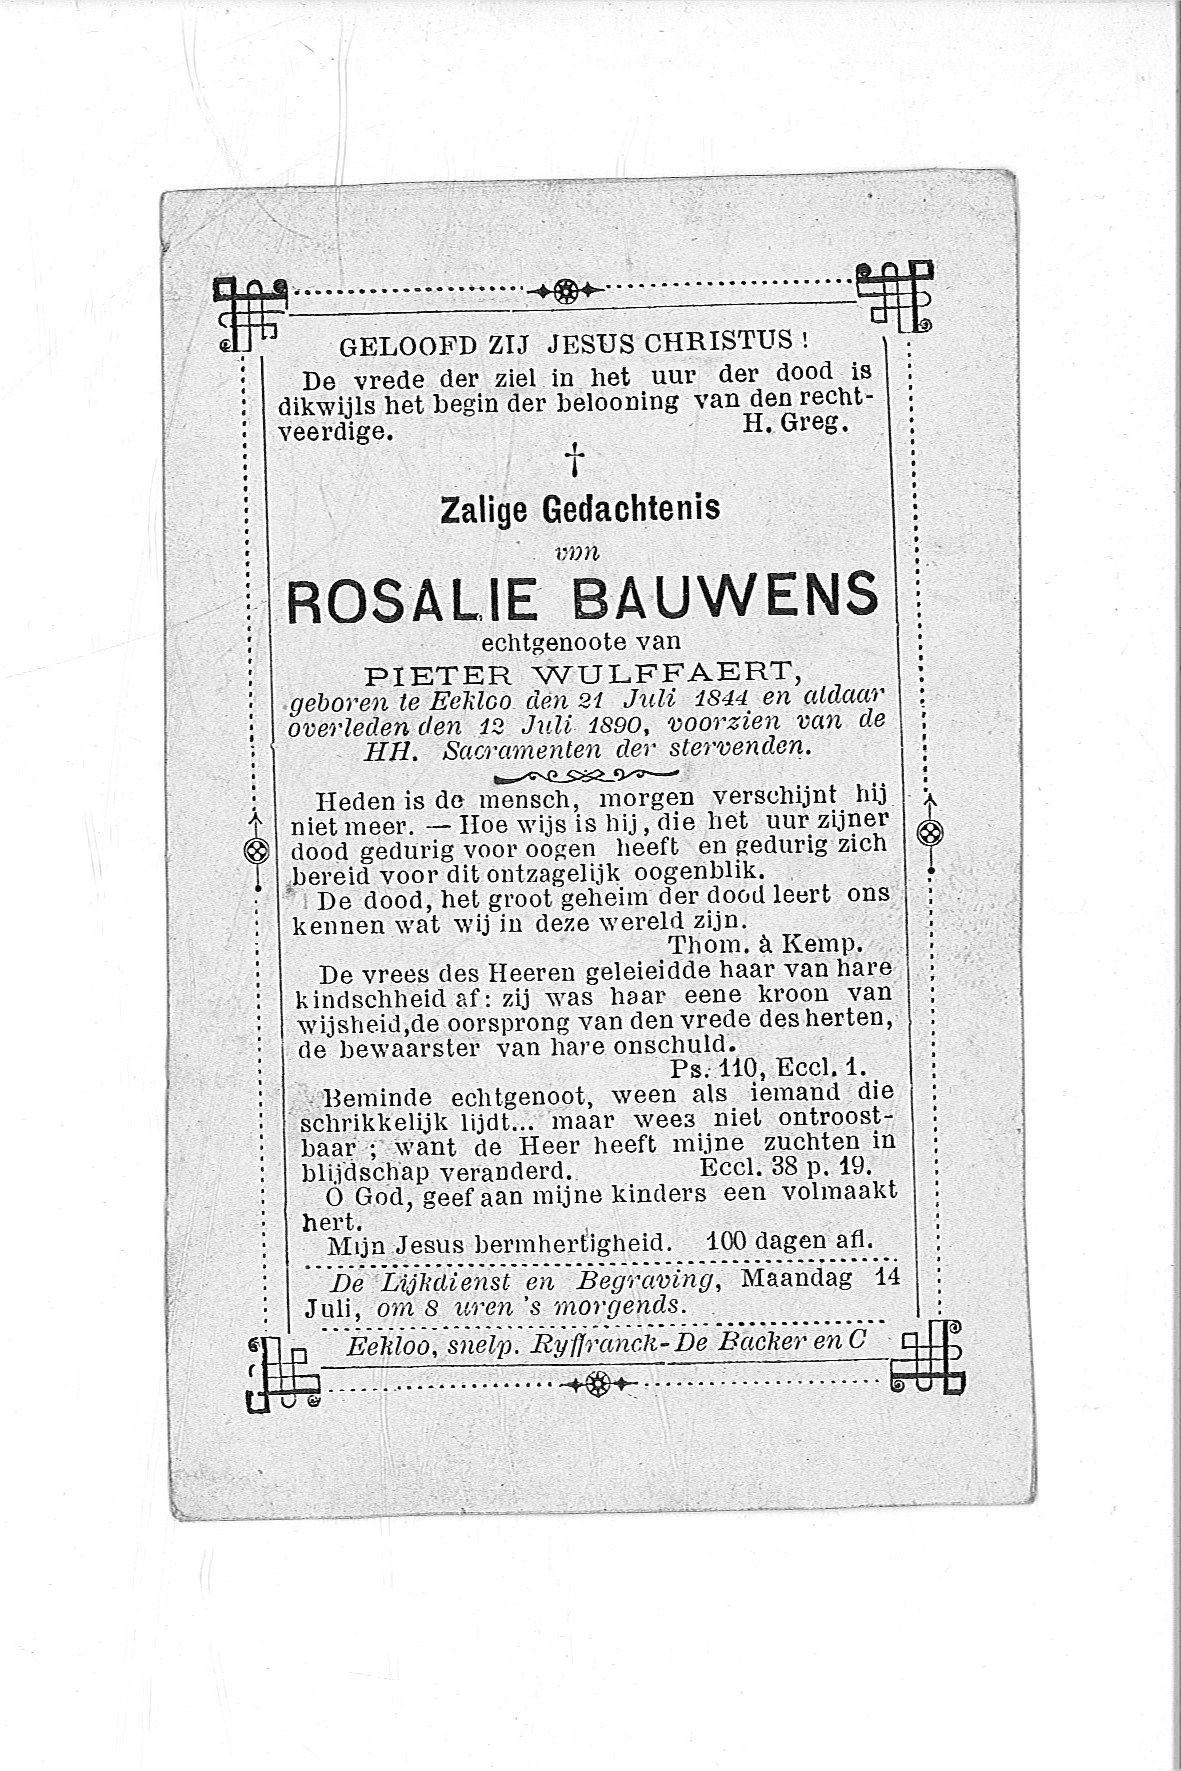 Rosalie(1890)20090806114958_00043.jpg